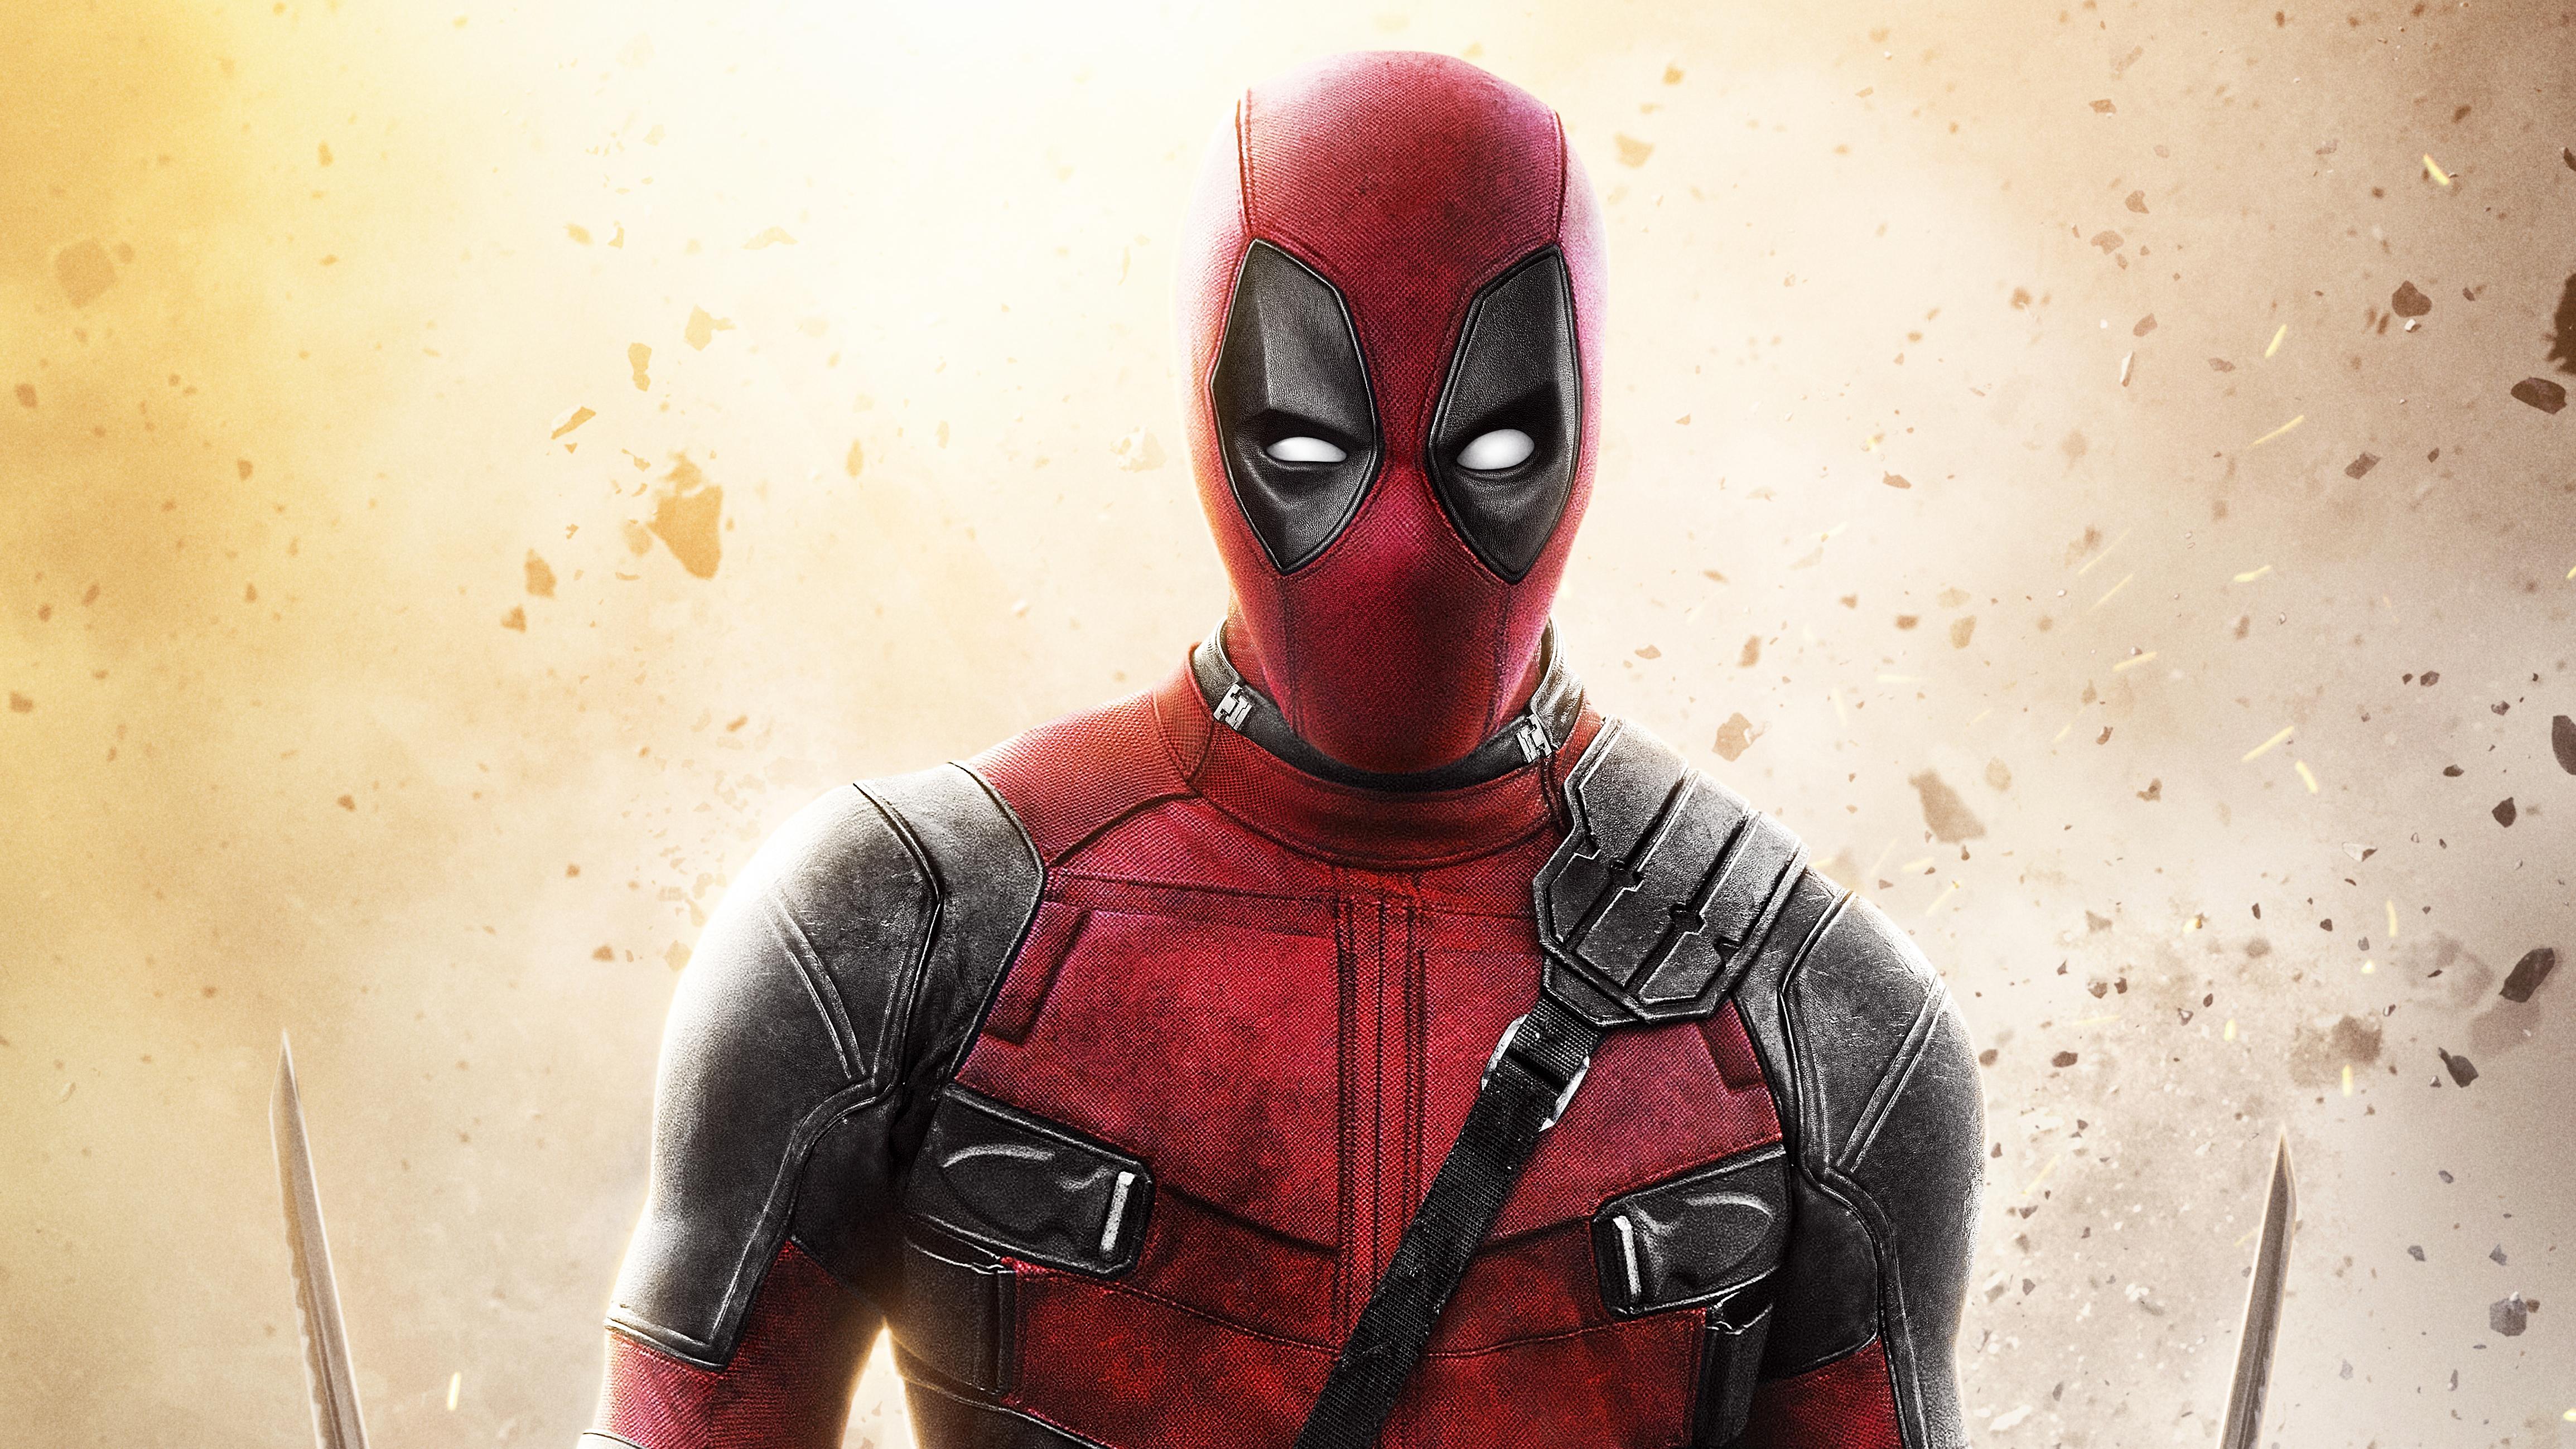 Deadpool 2 4k Ultra Hd Wallpaper Background Image 4618x2598 Id 996855 Wallpaper Abyss